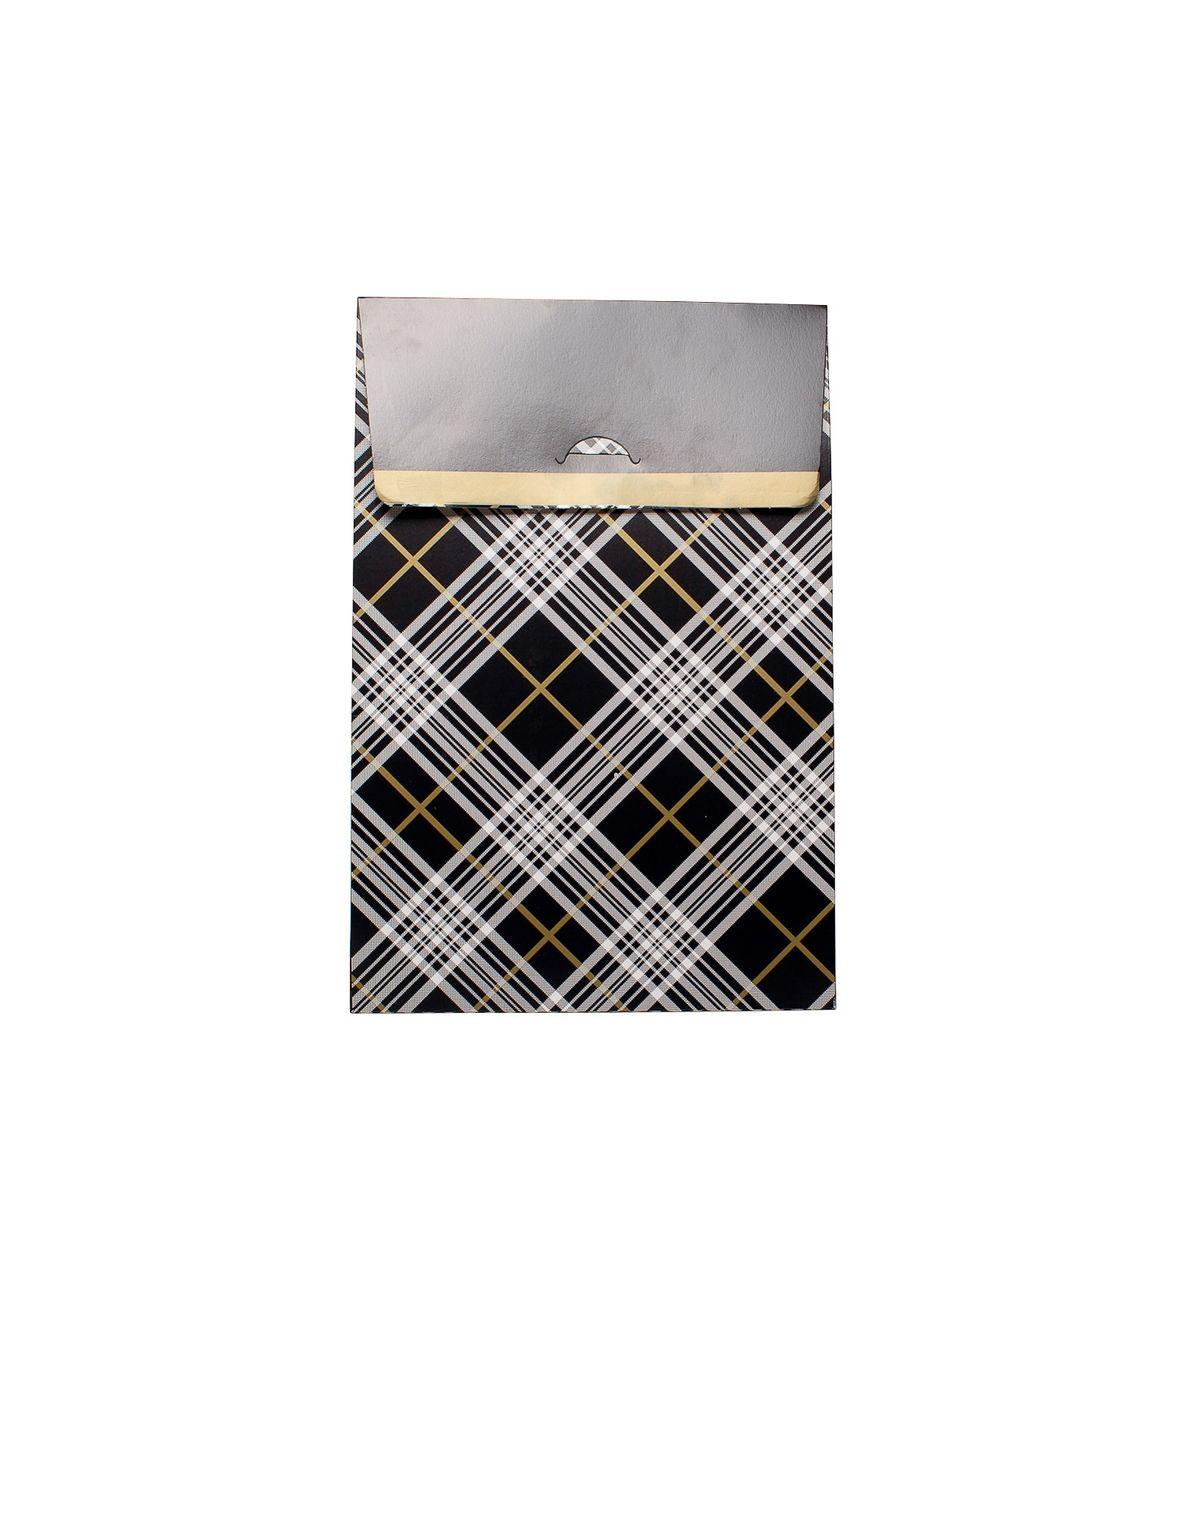 2050000785764-Embalagem-Presente-Estampa-Xadrez-UNICA-U-1-2-3